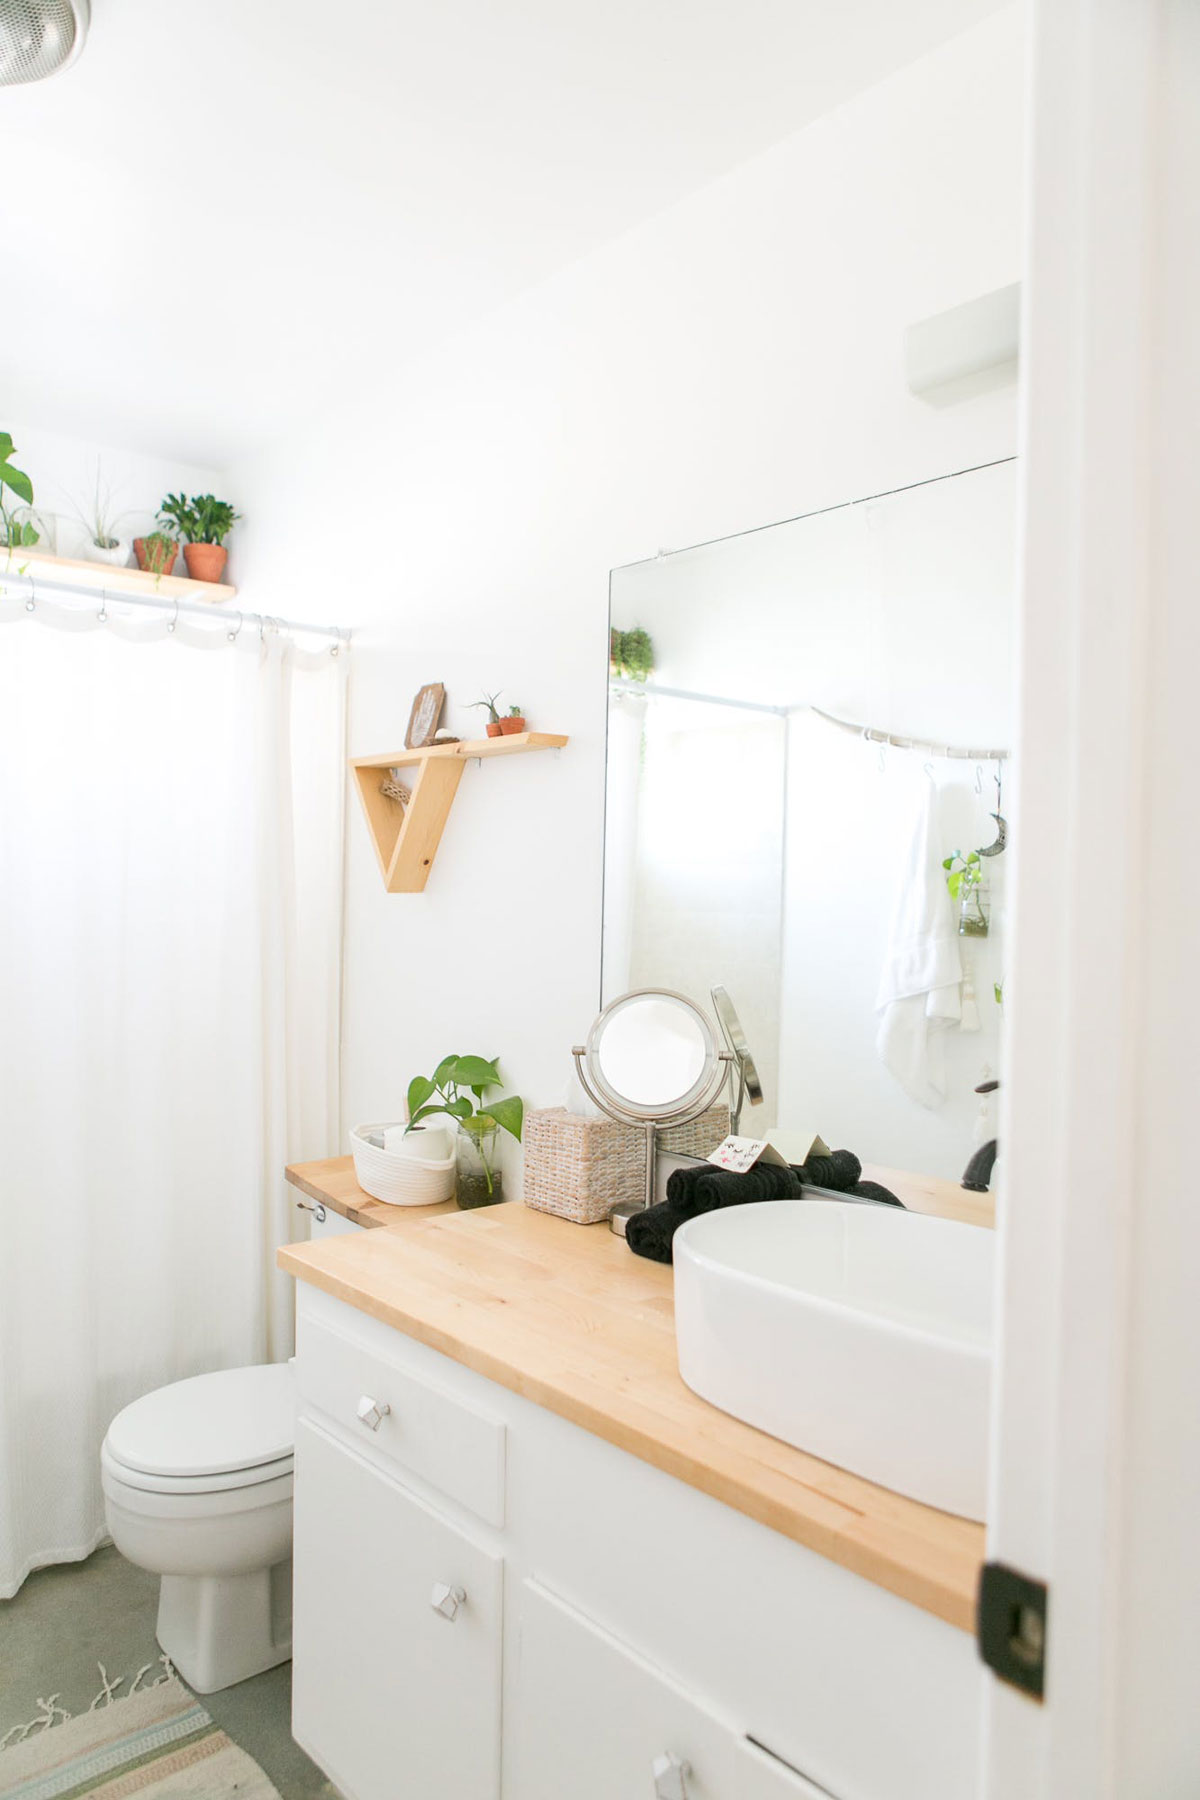 Desert Inspired Bathroom at Casa Joshua Tree Apartment Therapy Home Tour Photo Cred: Marisa Vitale